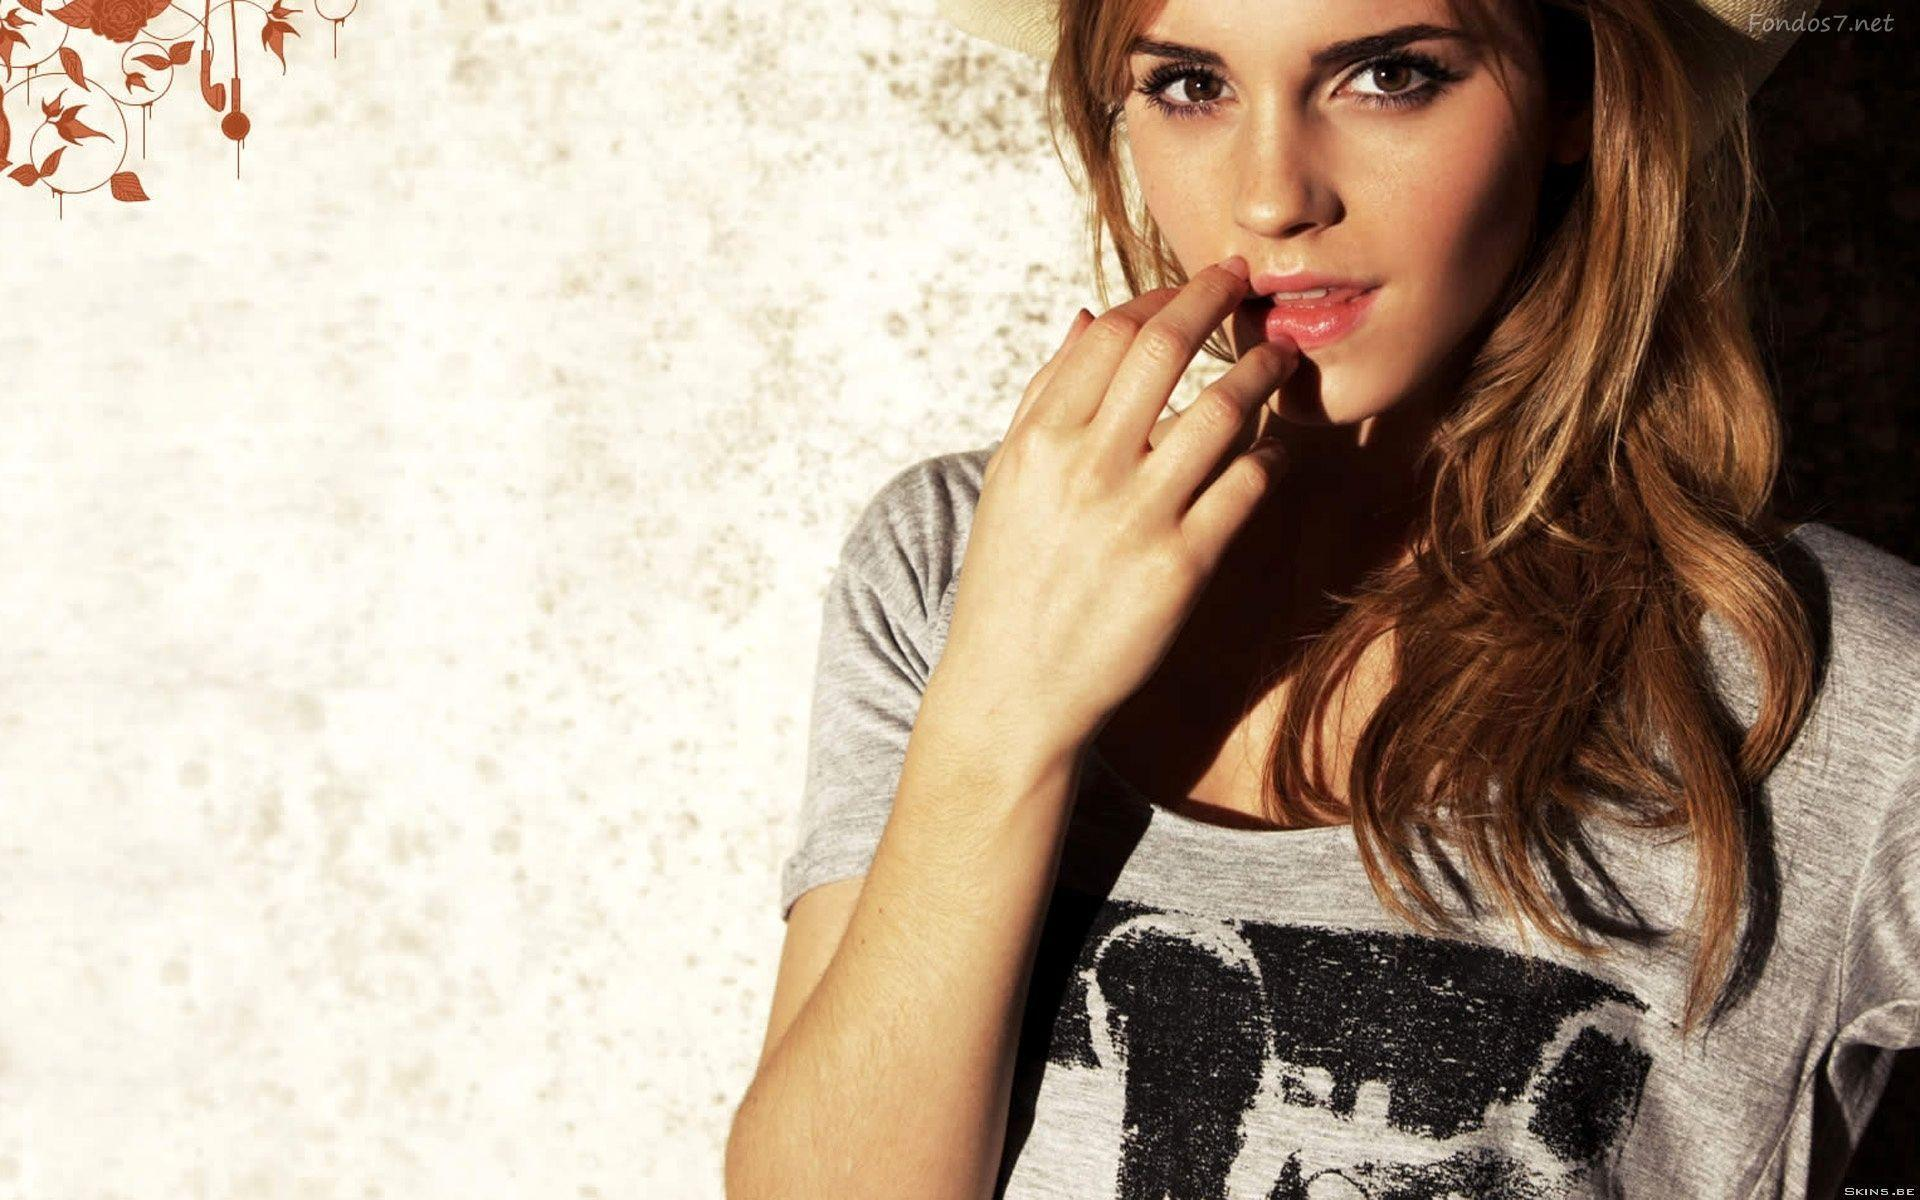 Emma Watson Wallpapers - Full HD wallpaper search - Wallpaperspalace.